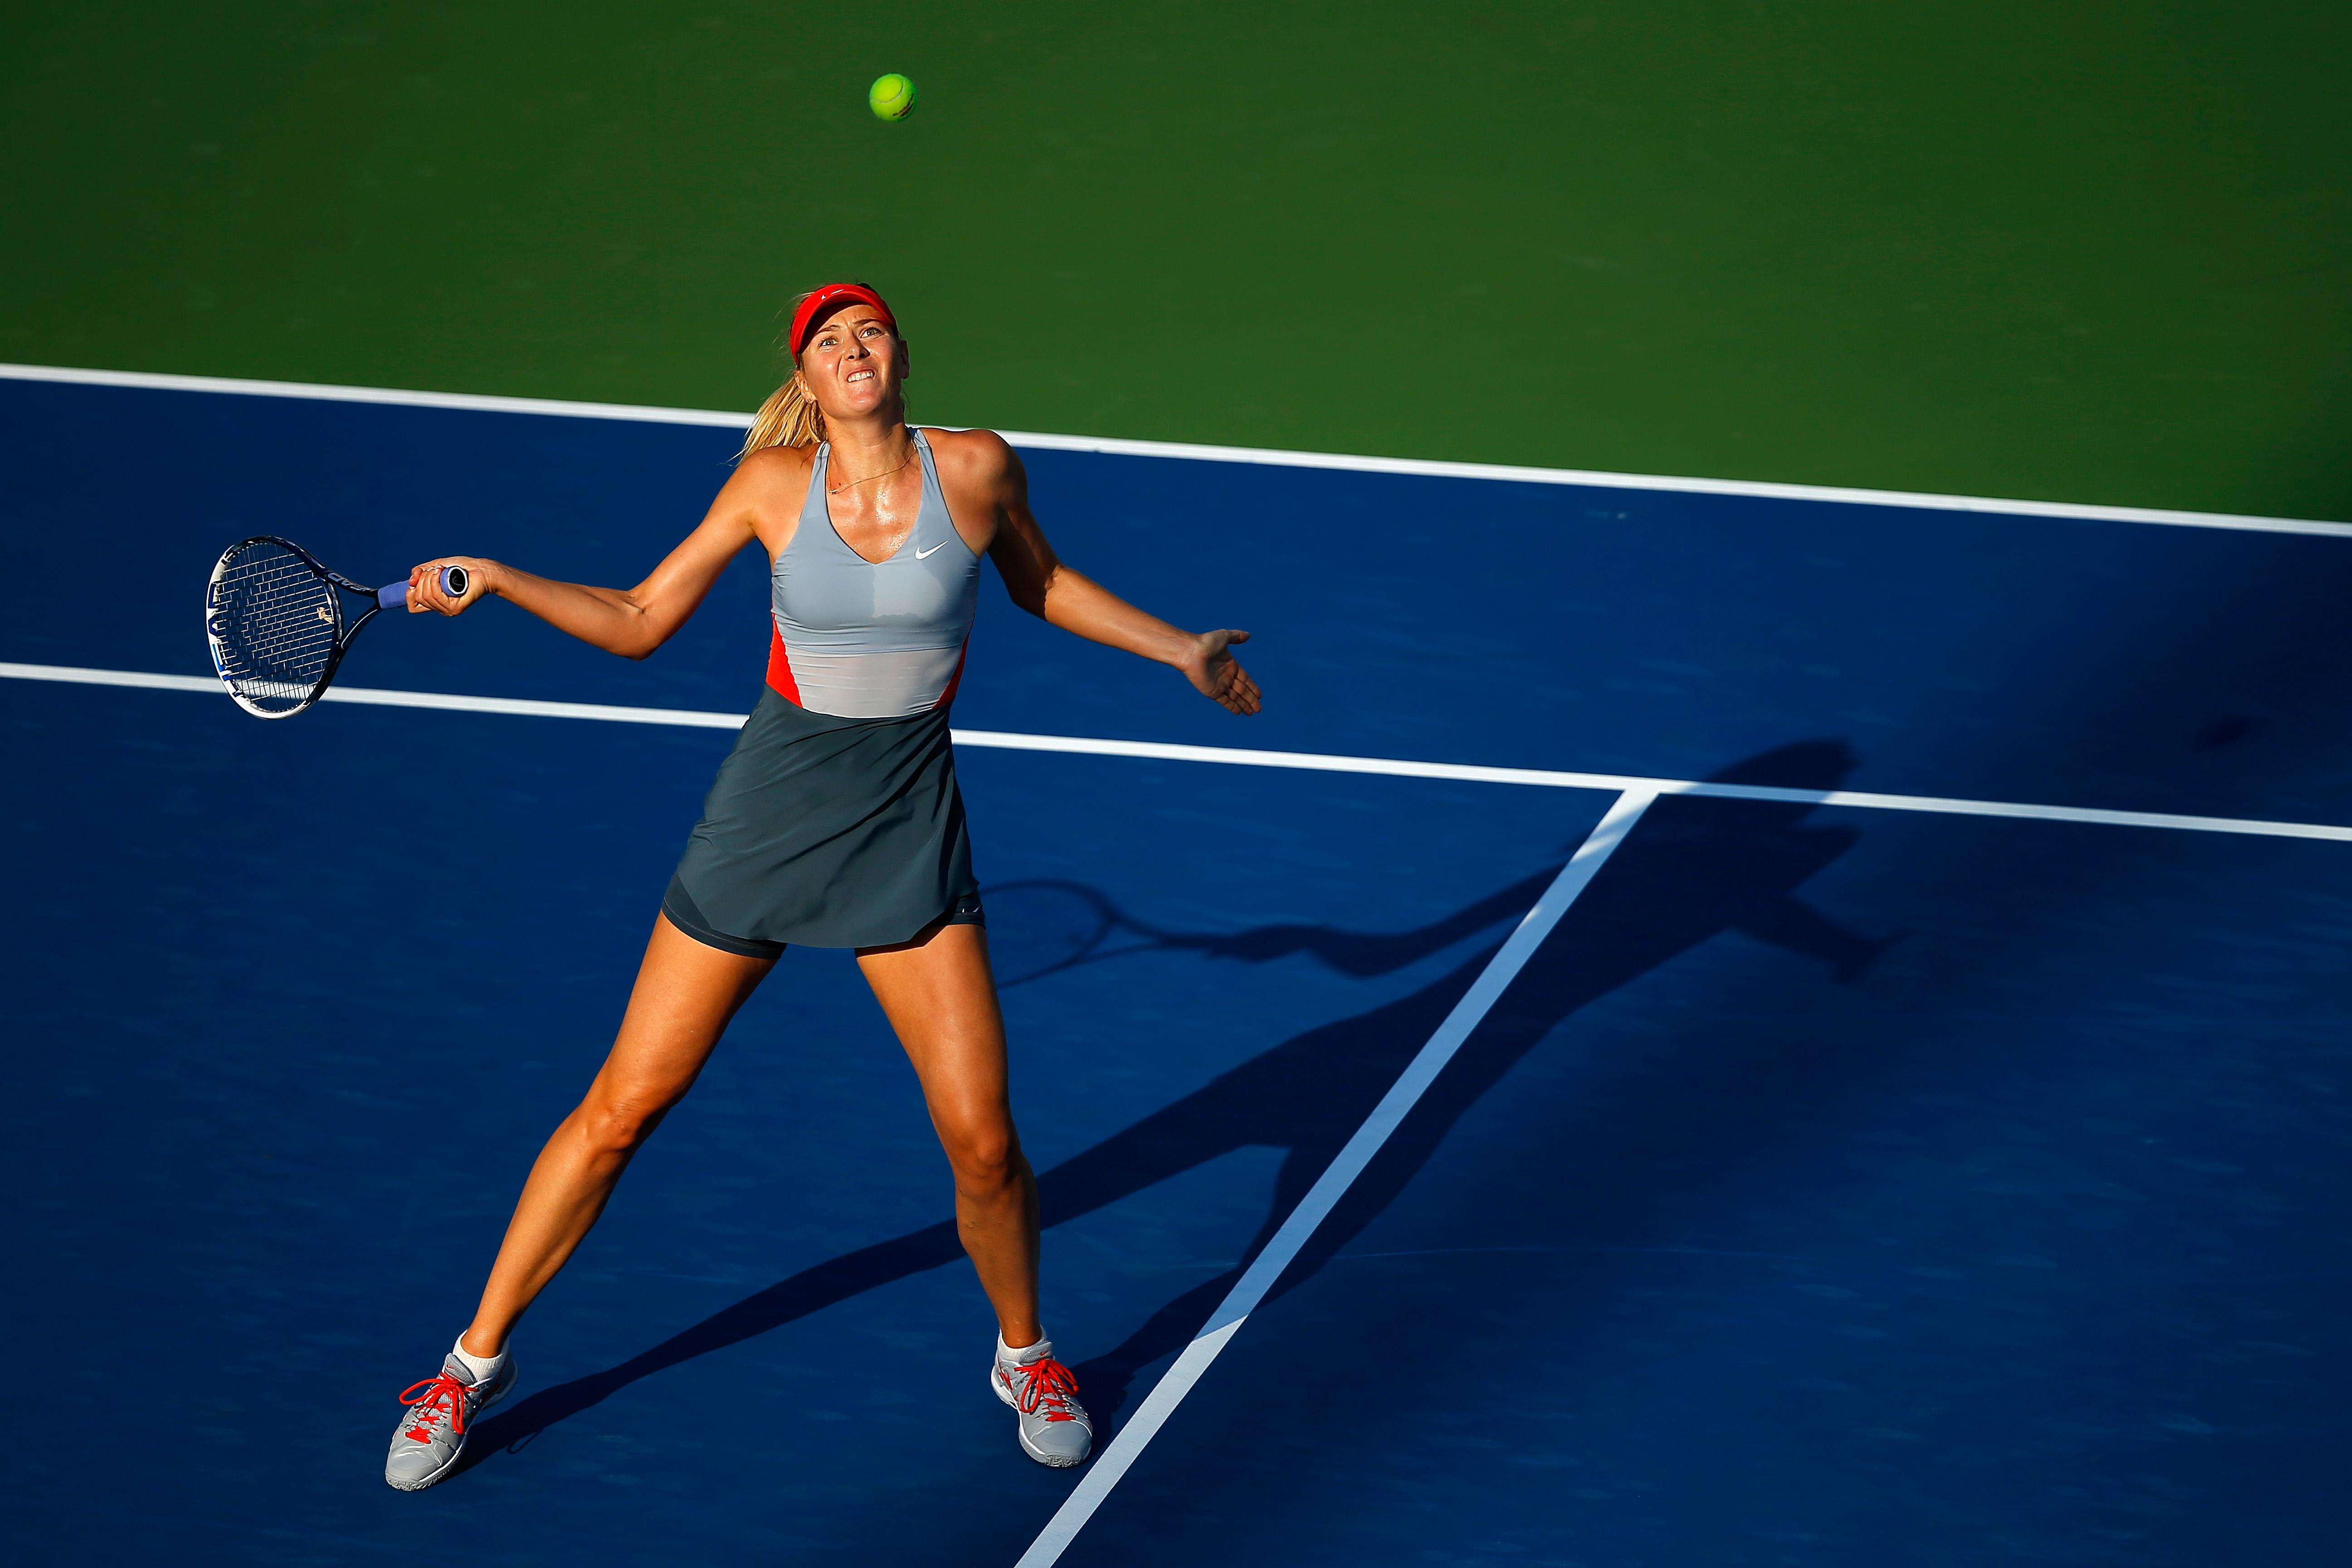 We weren't fans of her night dress, but Sharapova's Nike day kit had a chic modern cut.